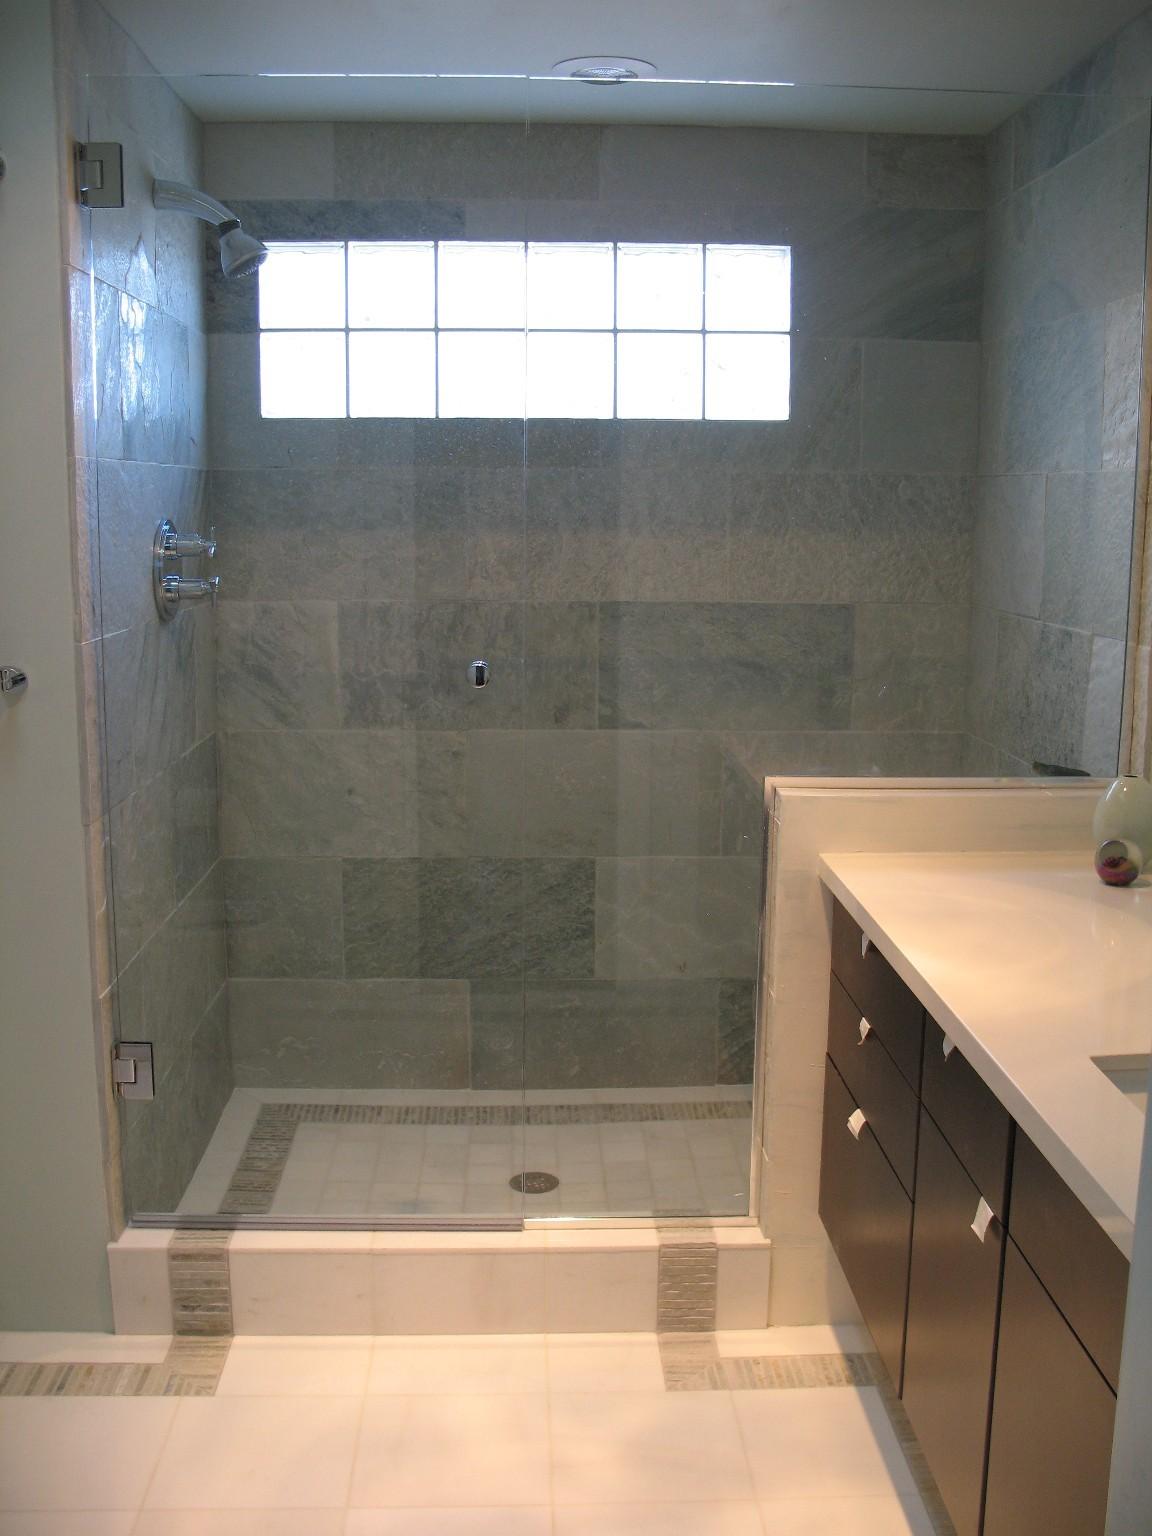 30 shower tile ideas on a budget 2021